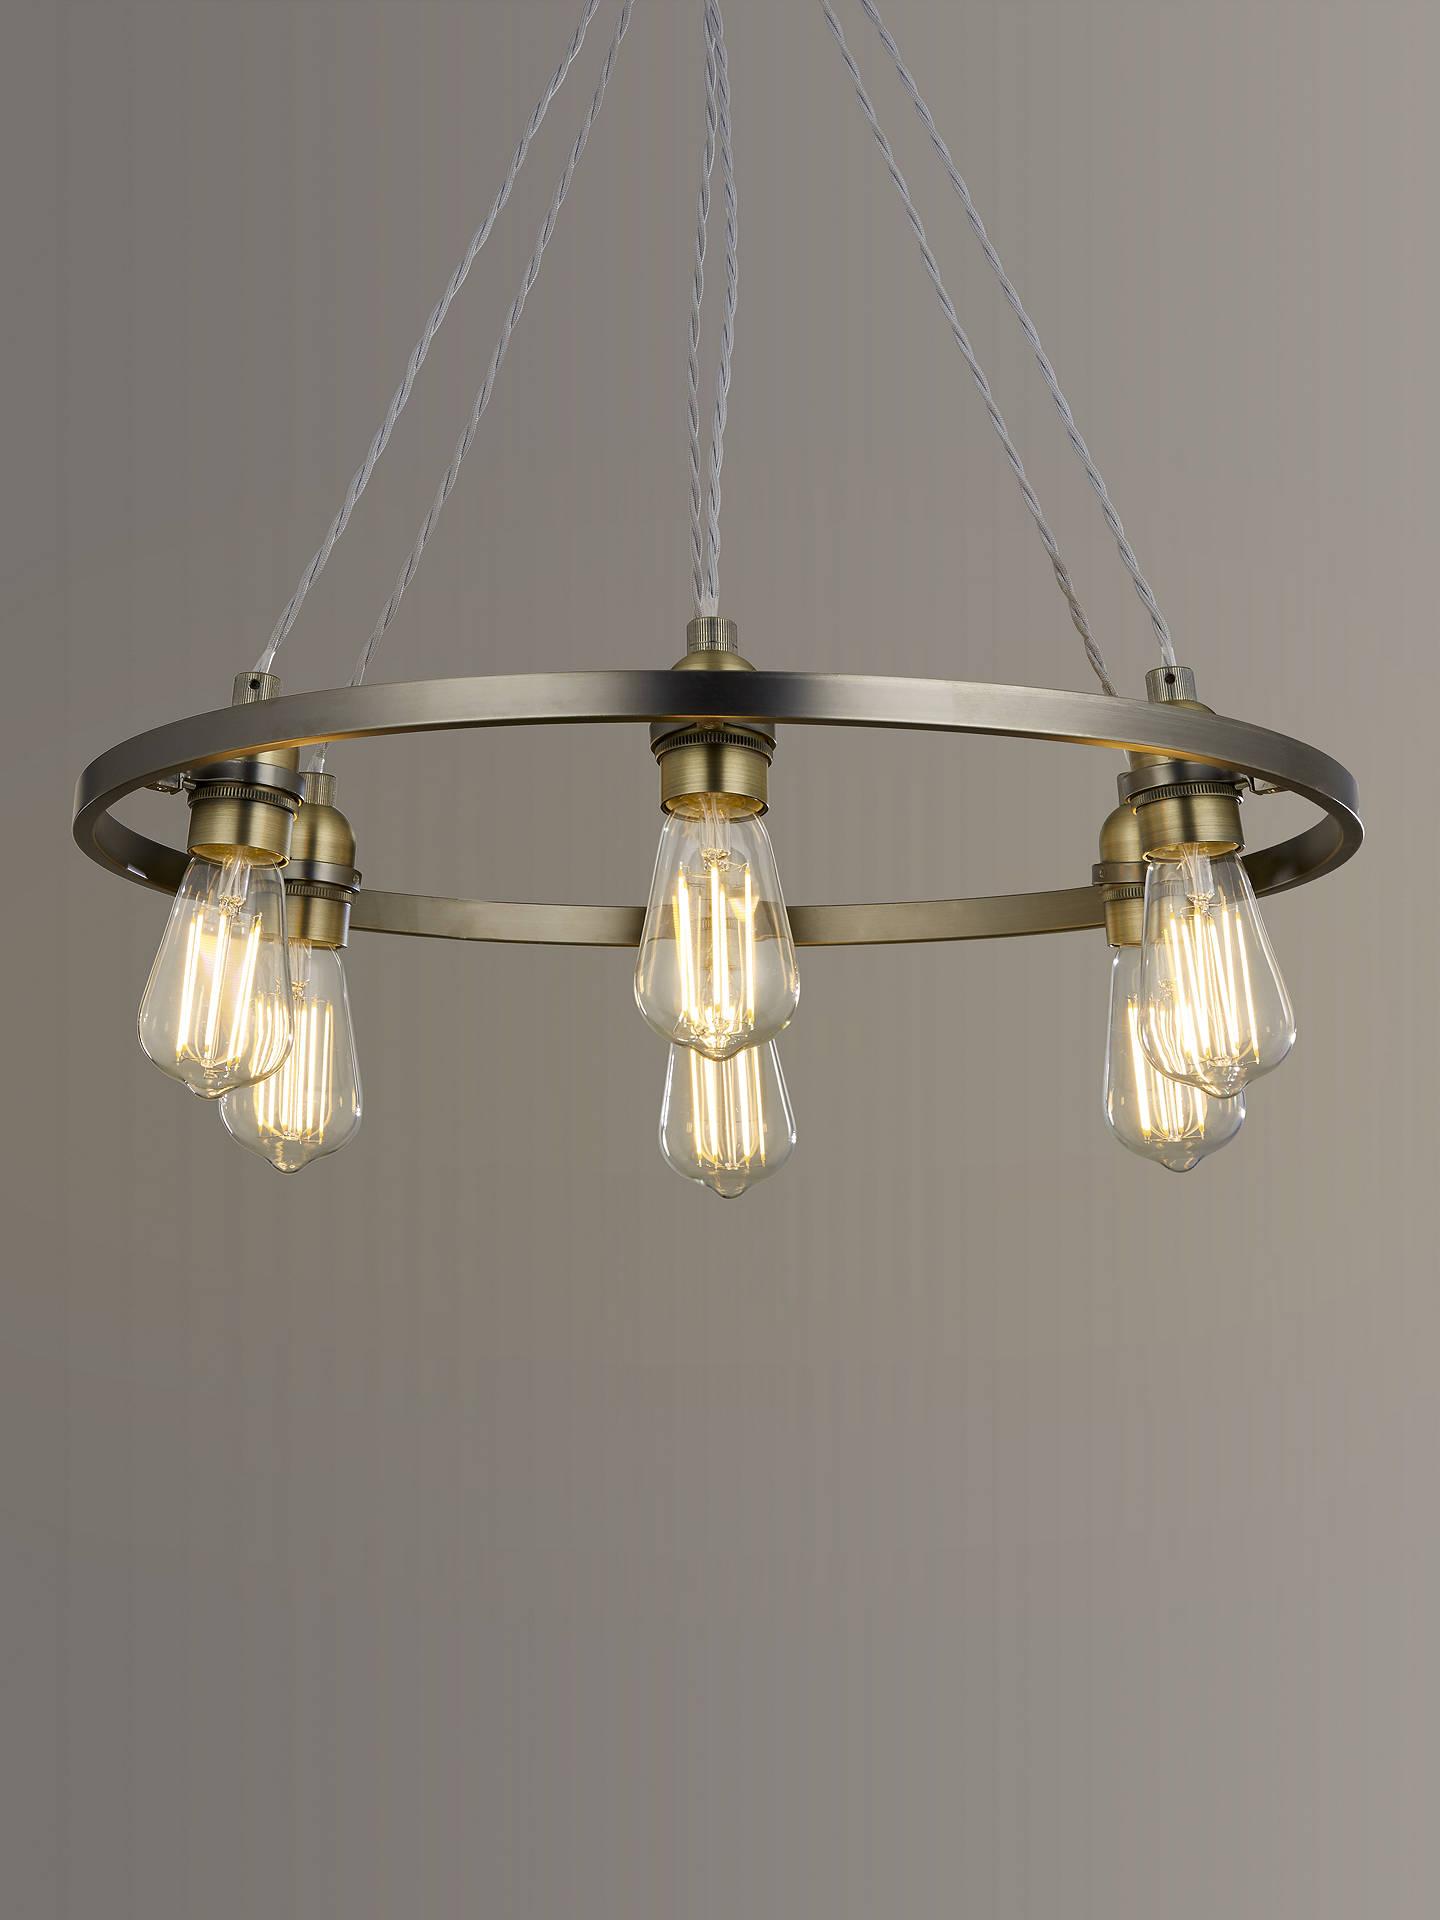 John Lewis & Partners Bistro Hoop Pendant Ceiling Light, 14 Light, Pewter